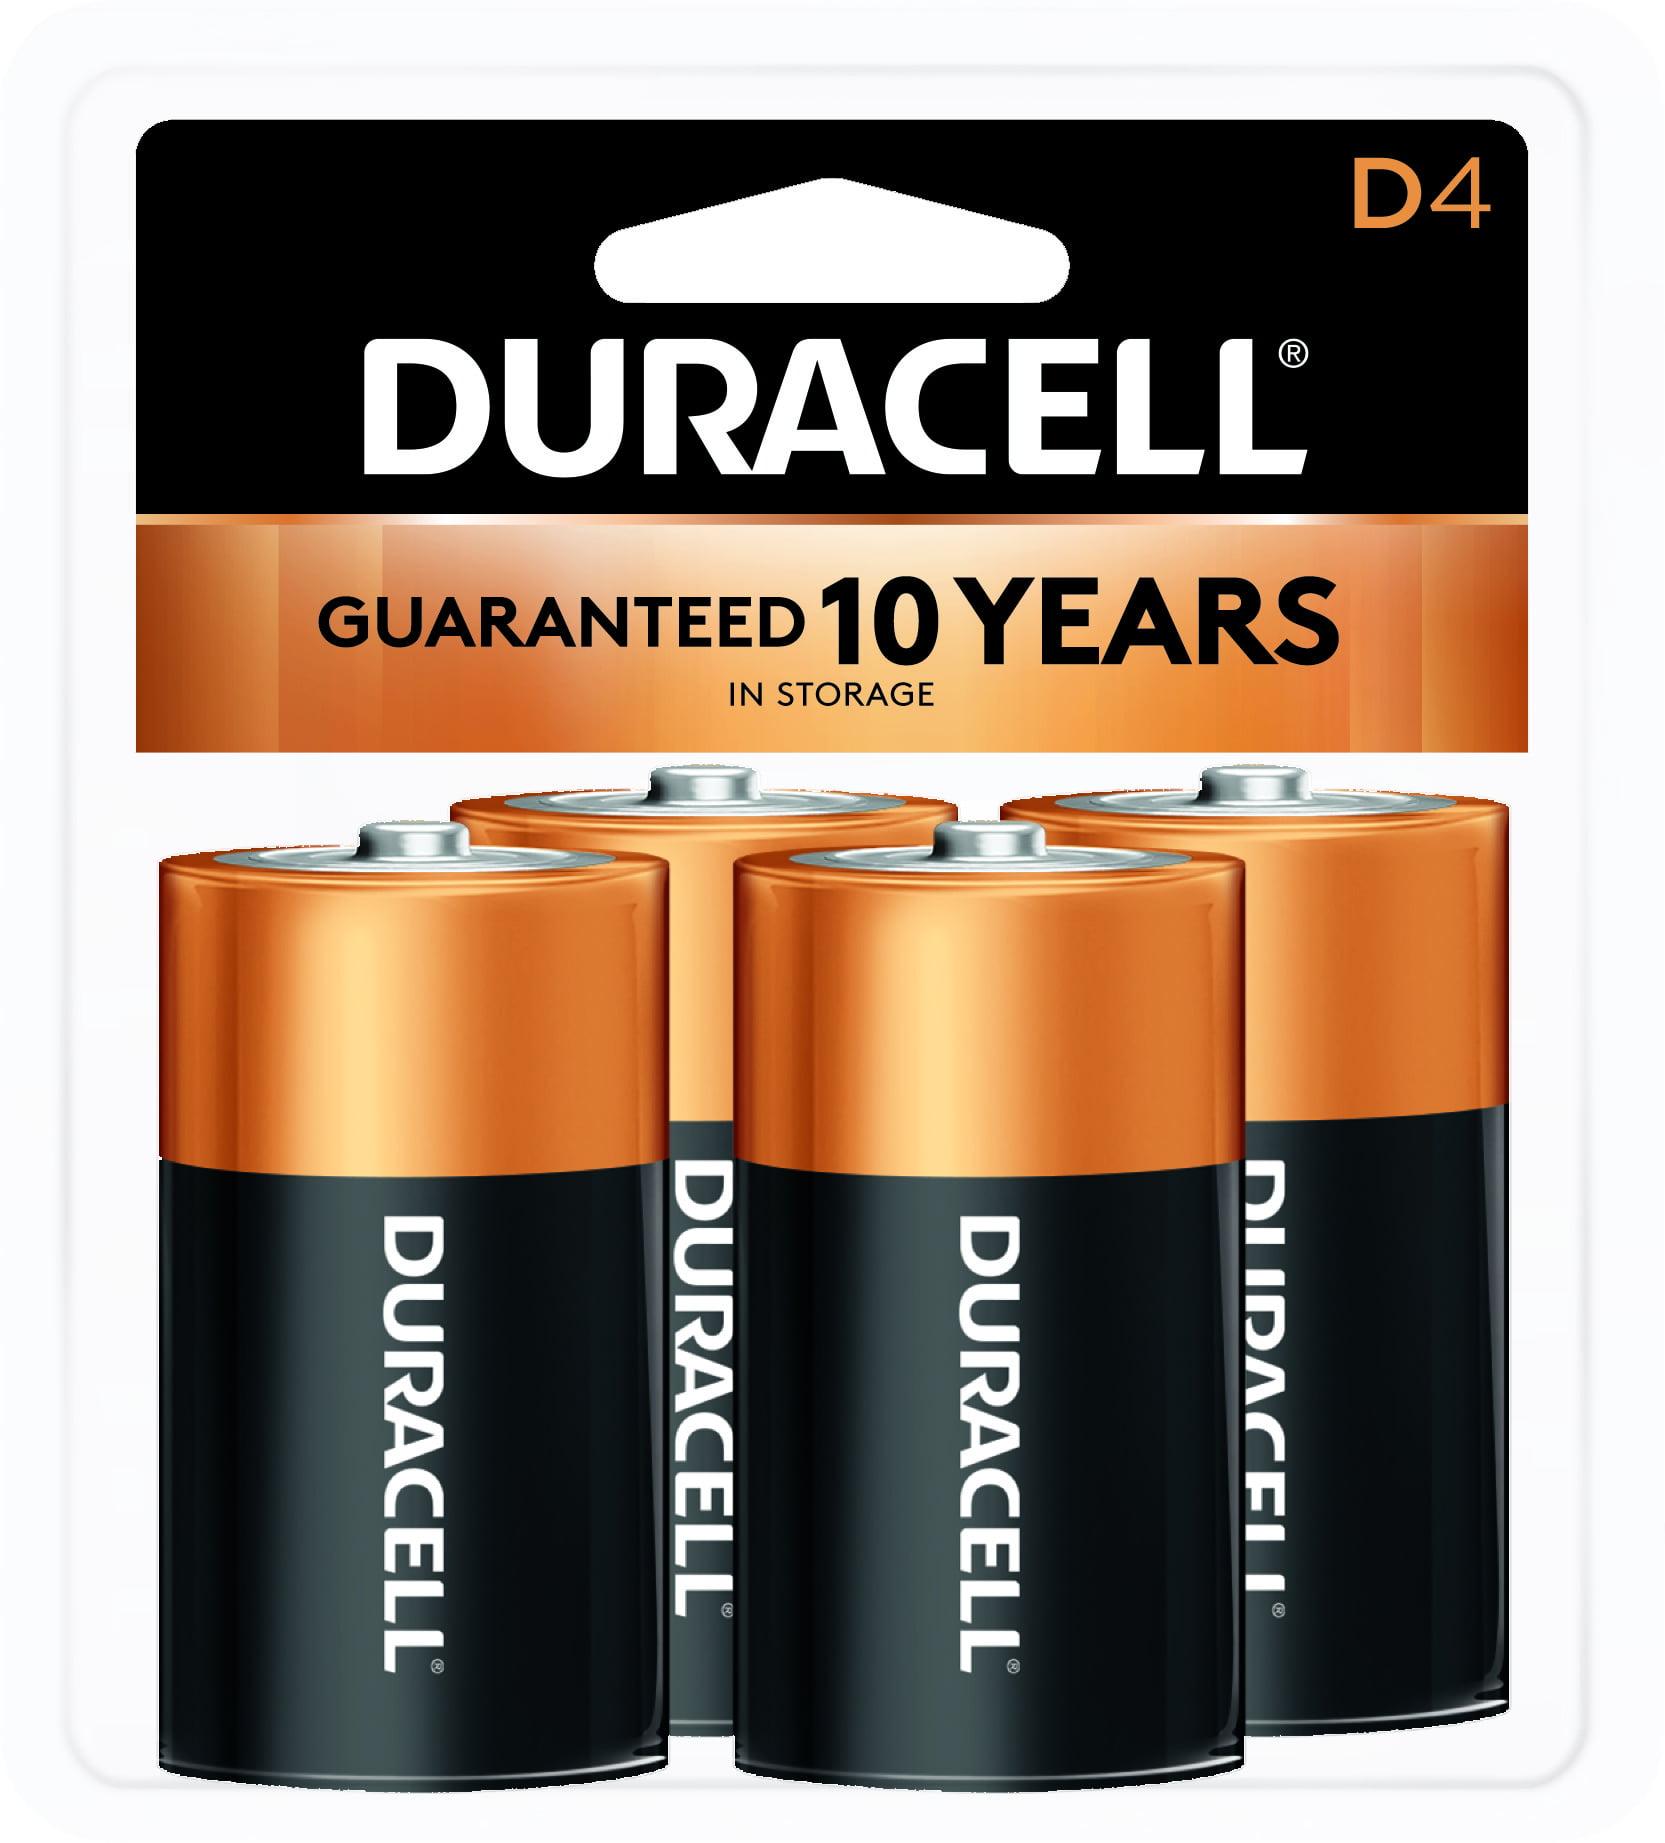 Duracell 1 5v Coppertop Alkaline D Batteries 4 Pack